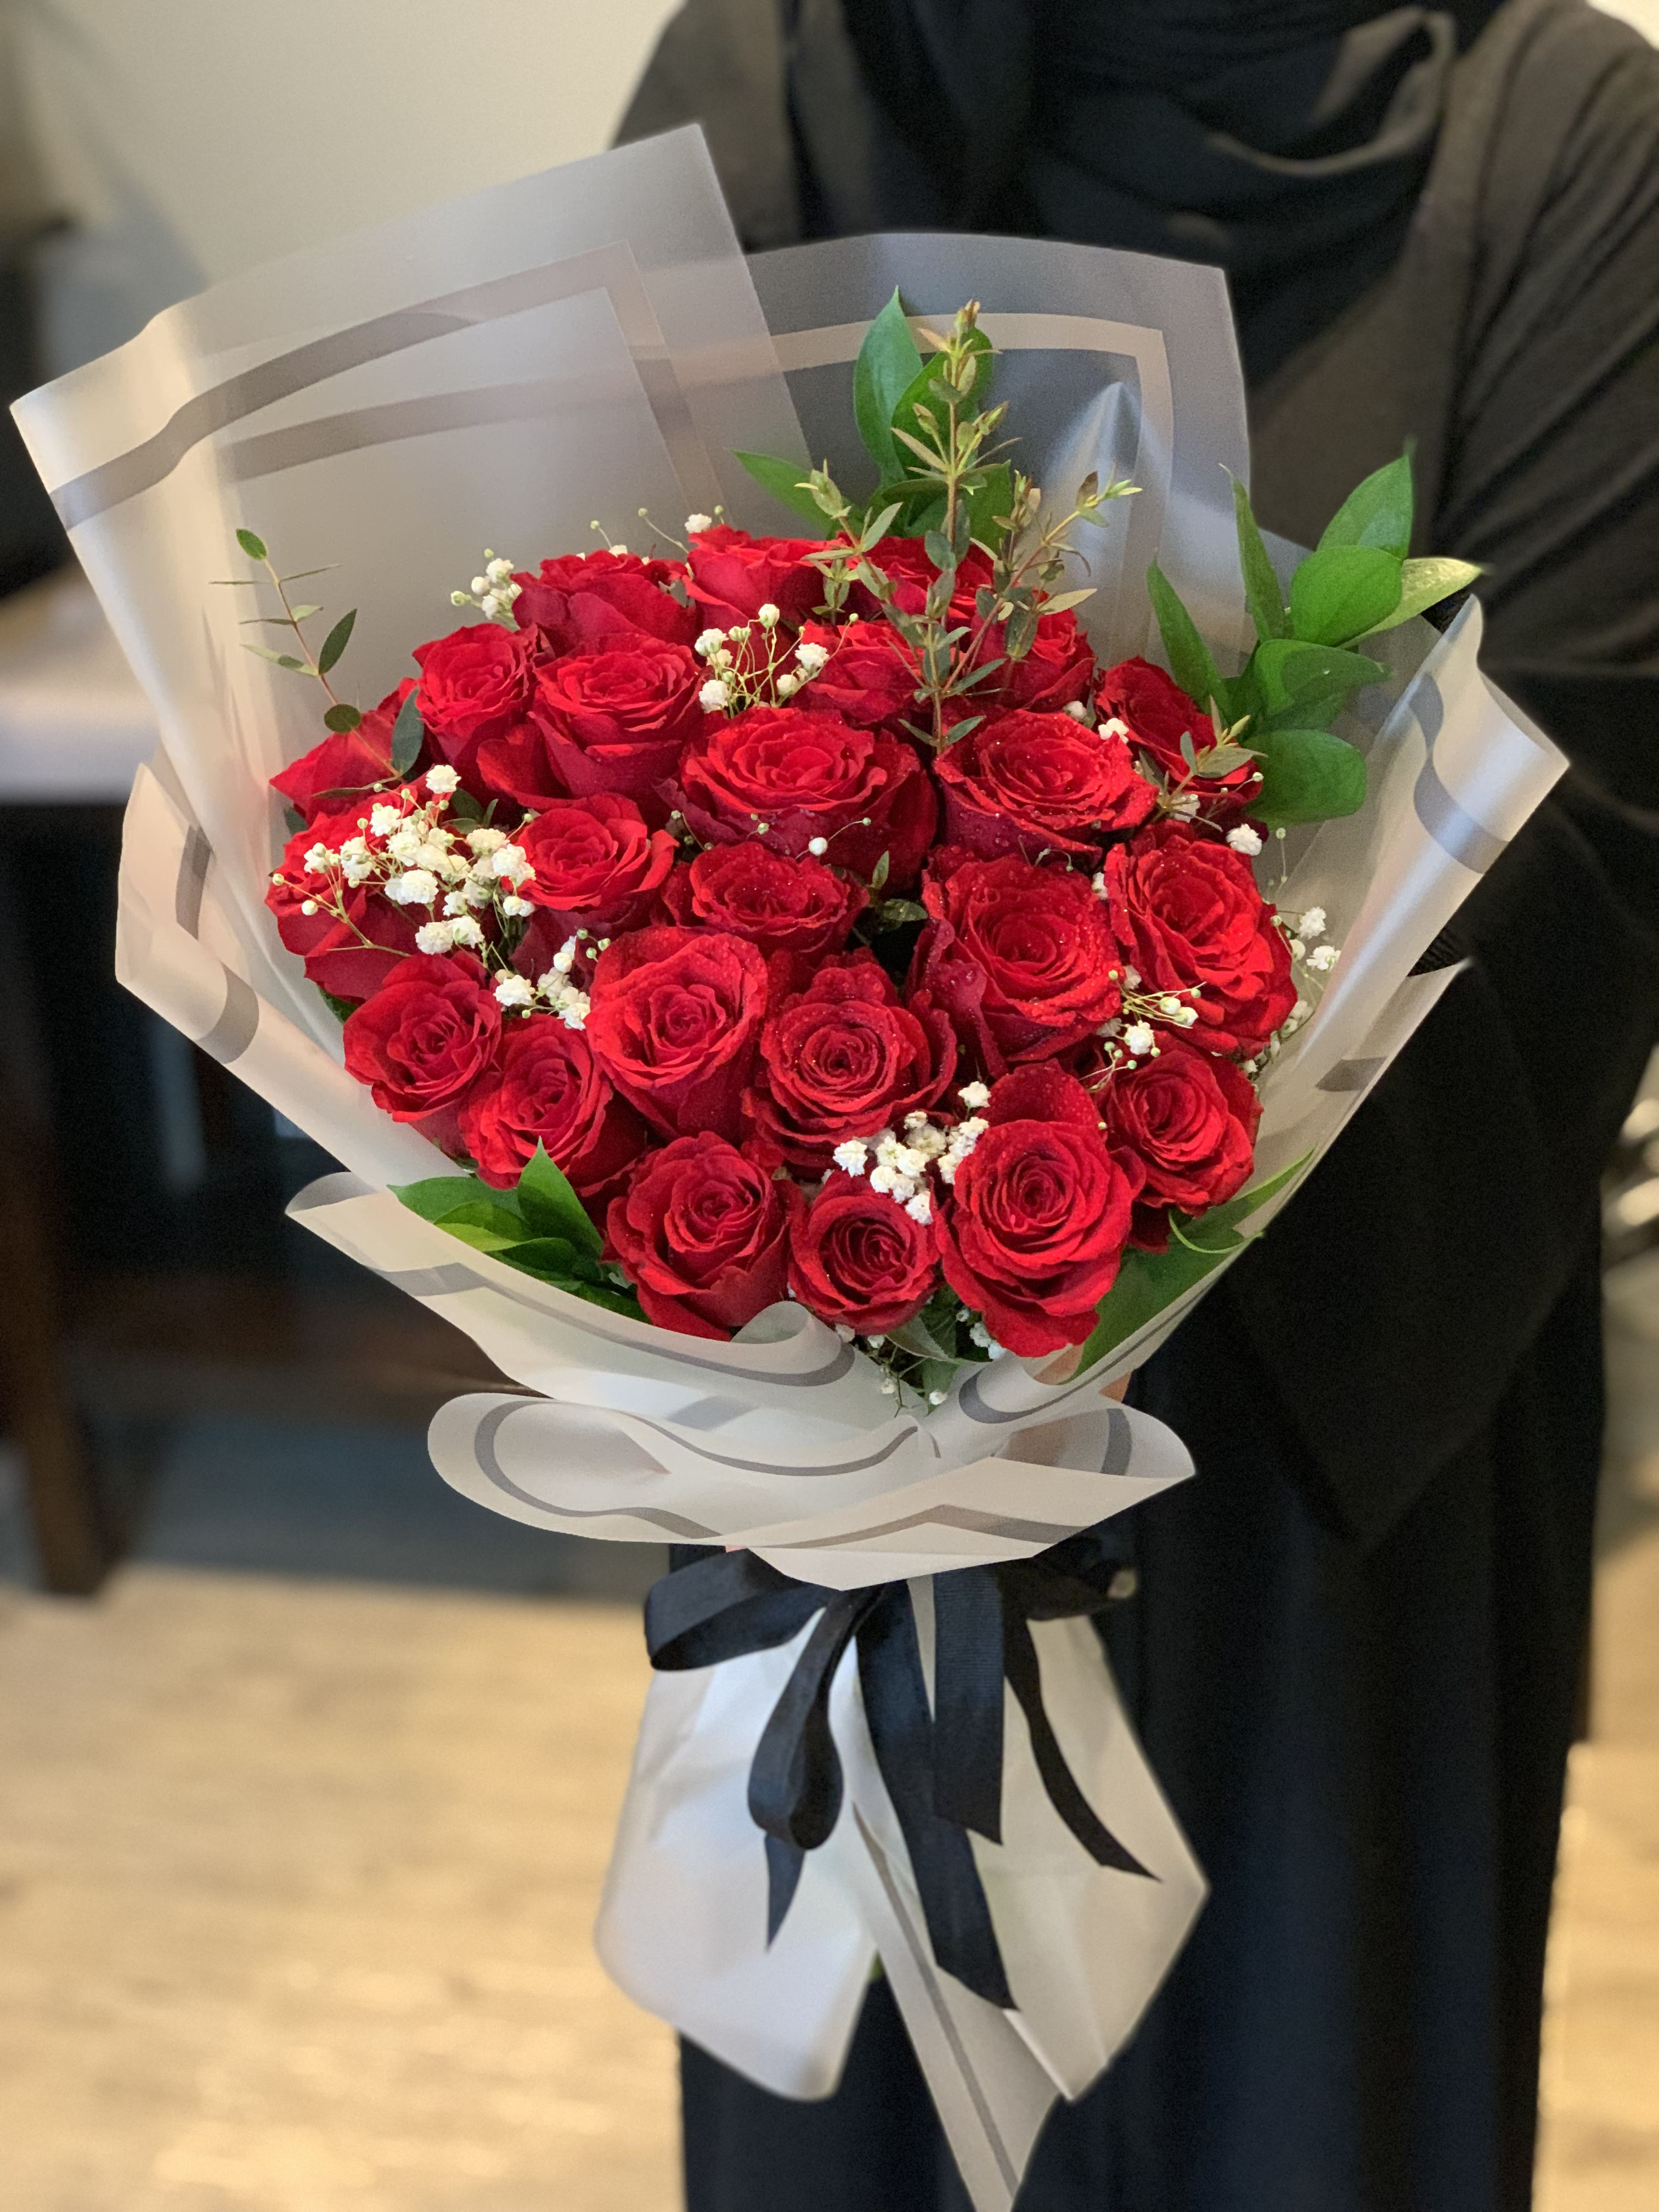 Pin By Pn On Fashion Valentine Flower Arrangements Flower Arrangement Designs Flower Gift Ideas